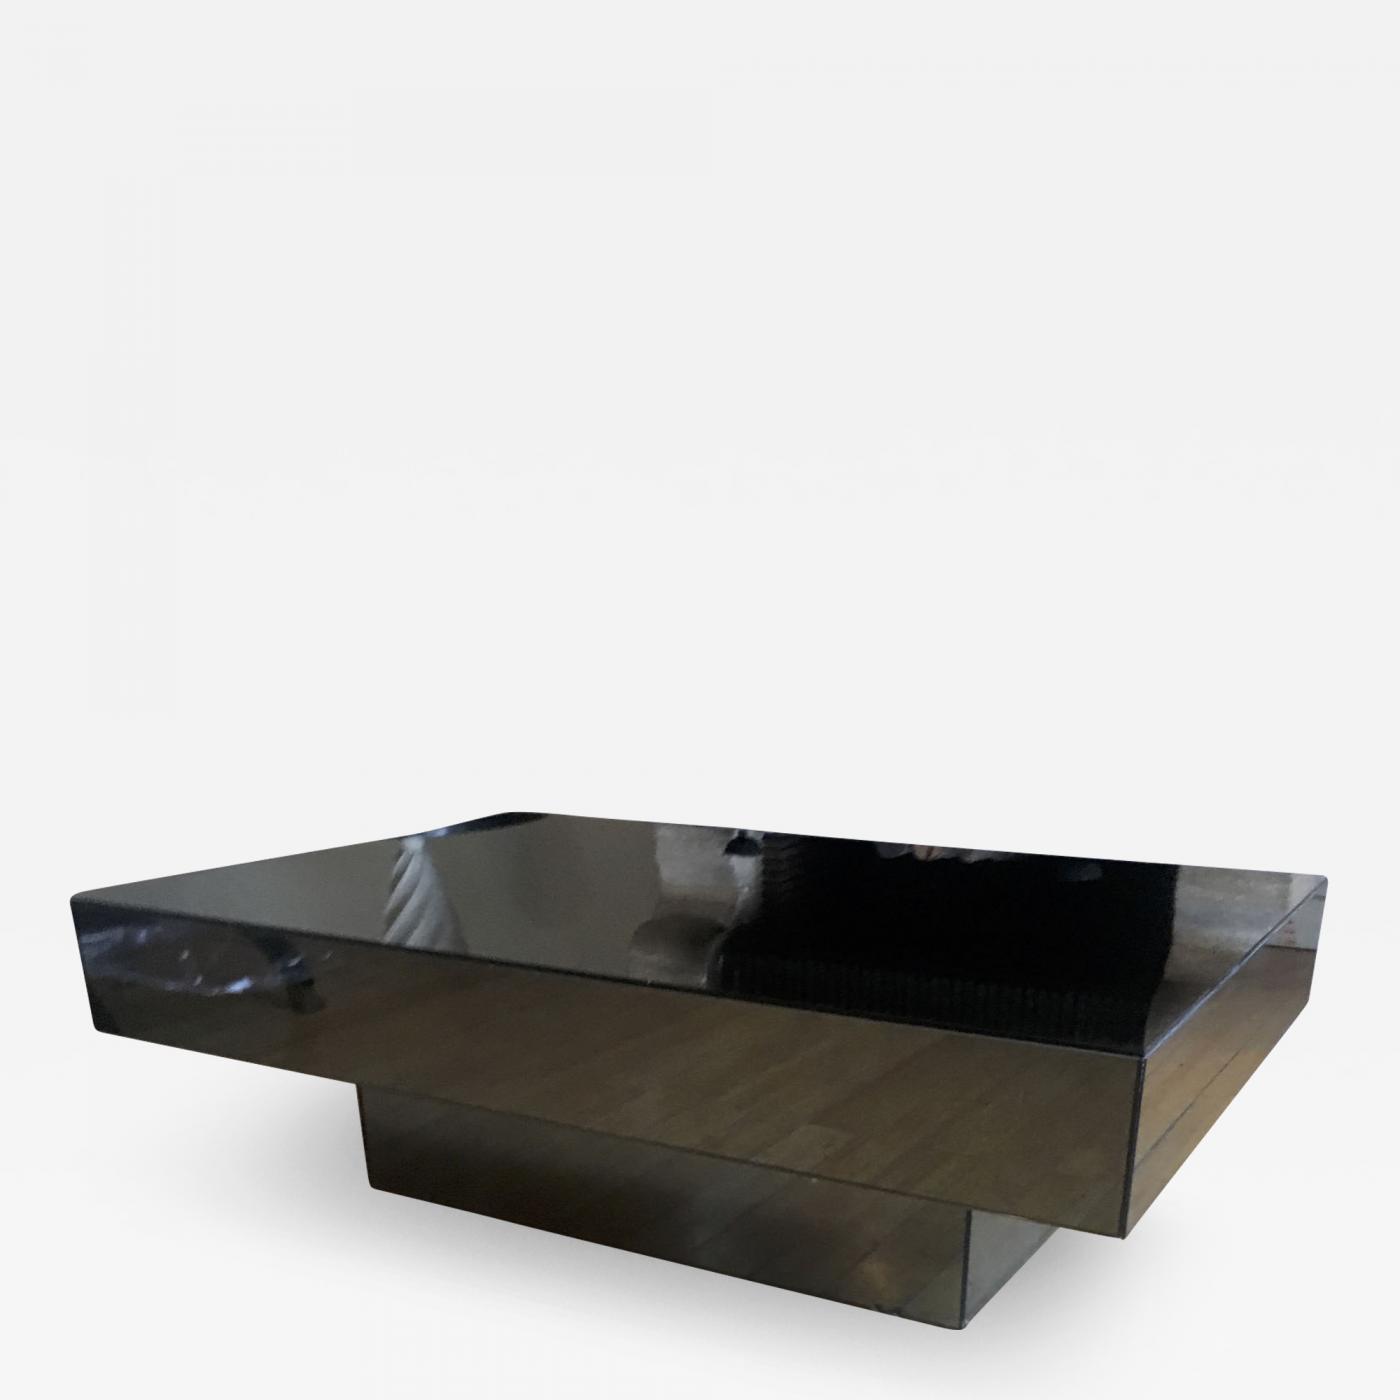 Seventies Big Square Pure Design Black Mirrored Coffee Table regarding size 1400 X 1400